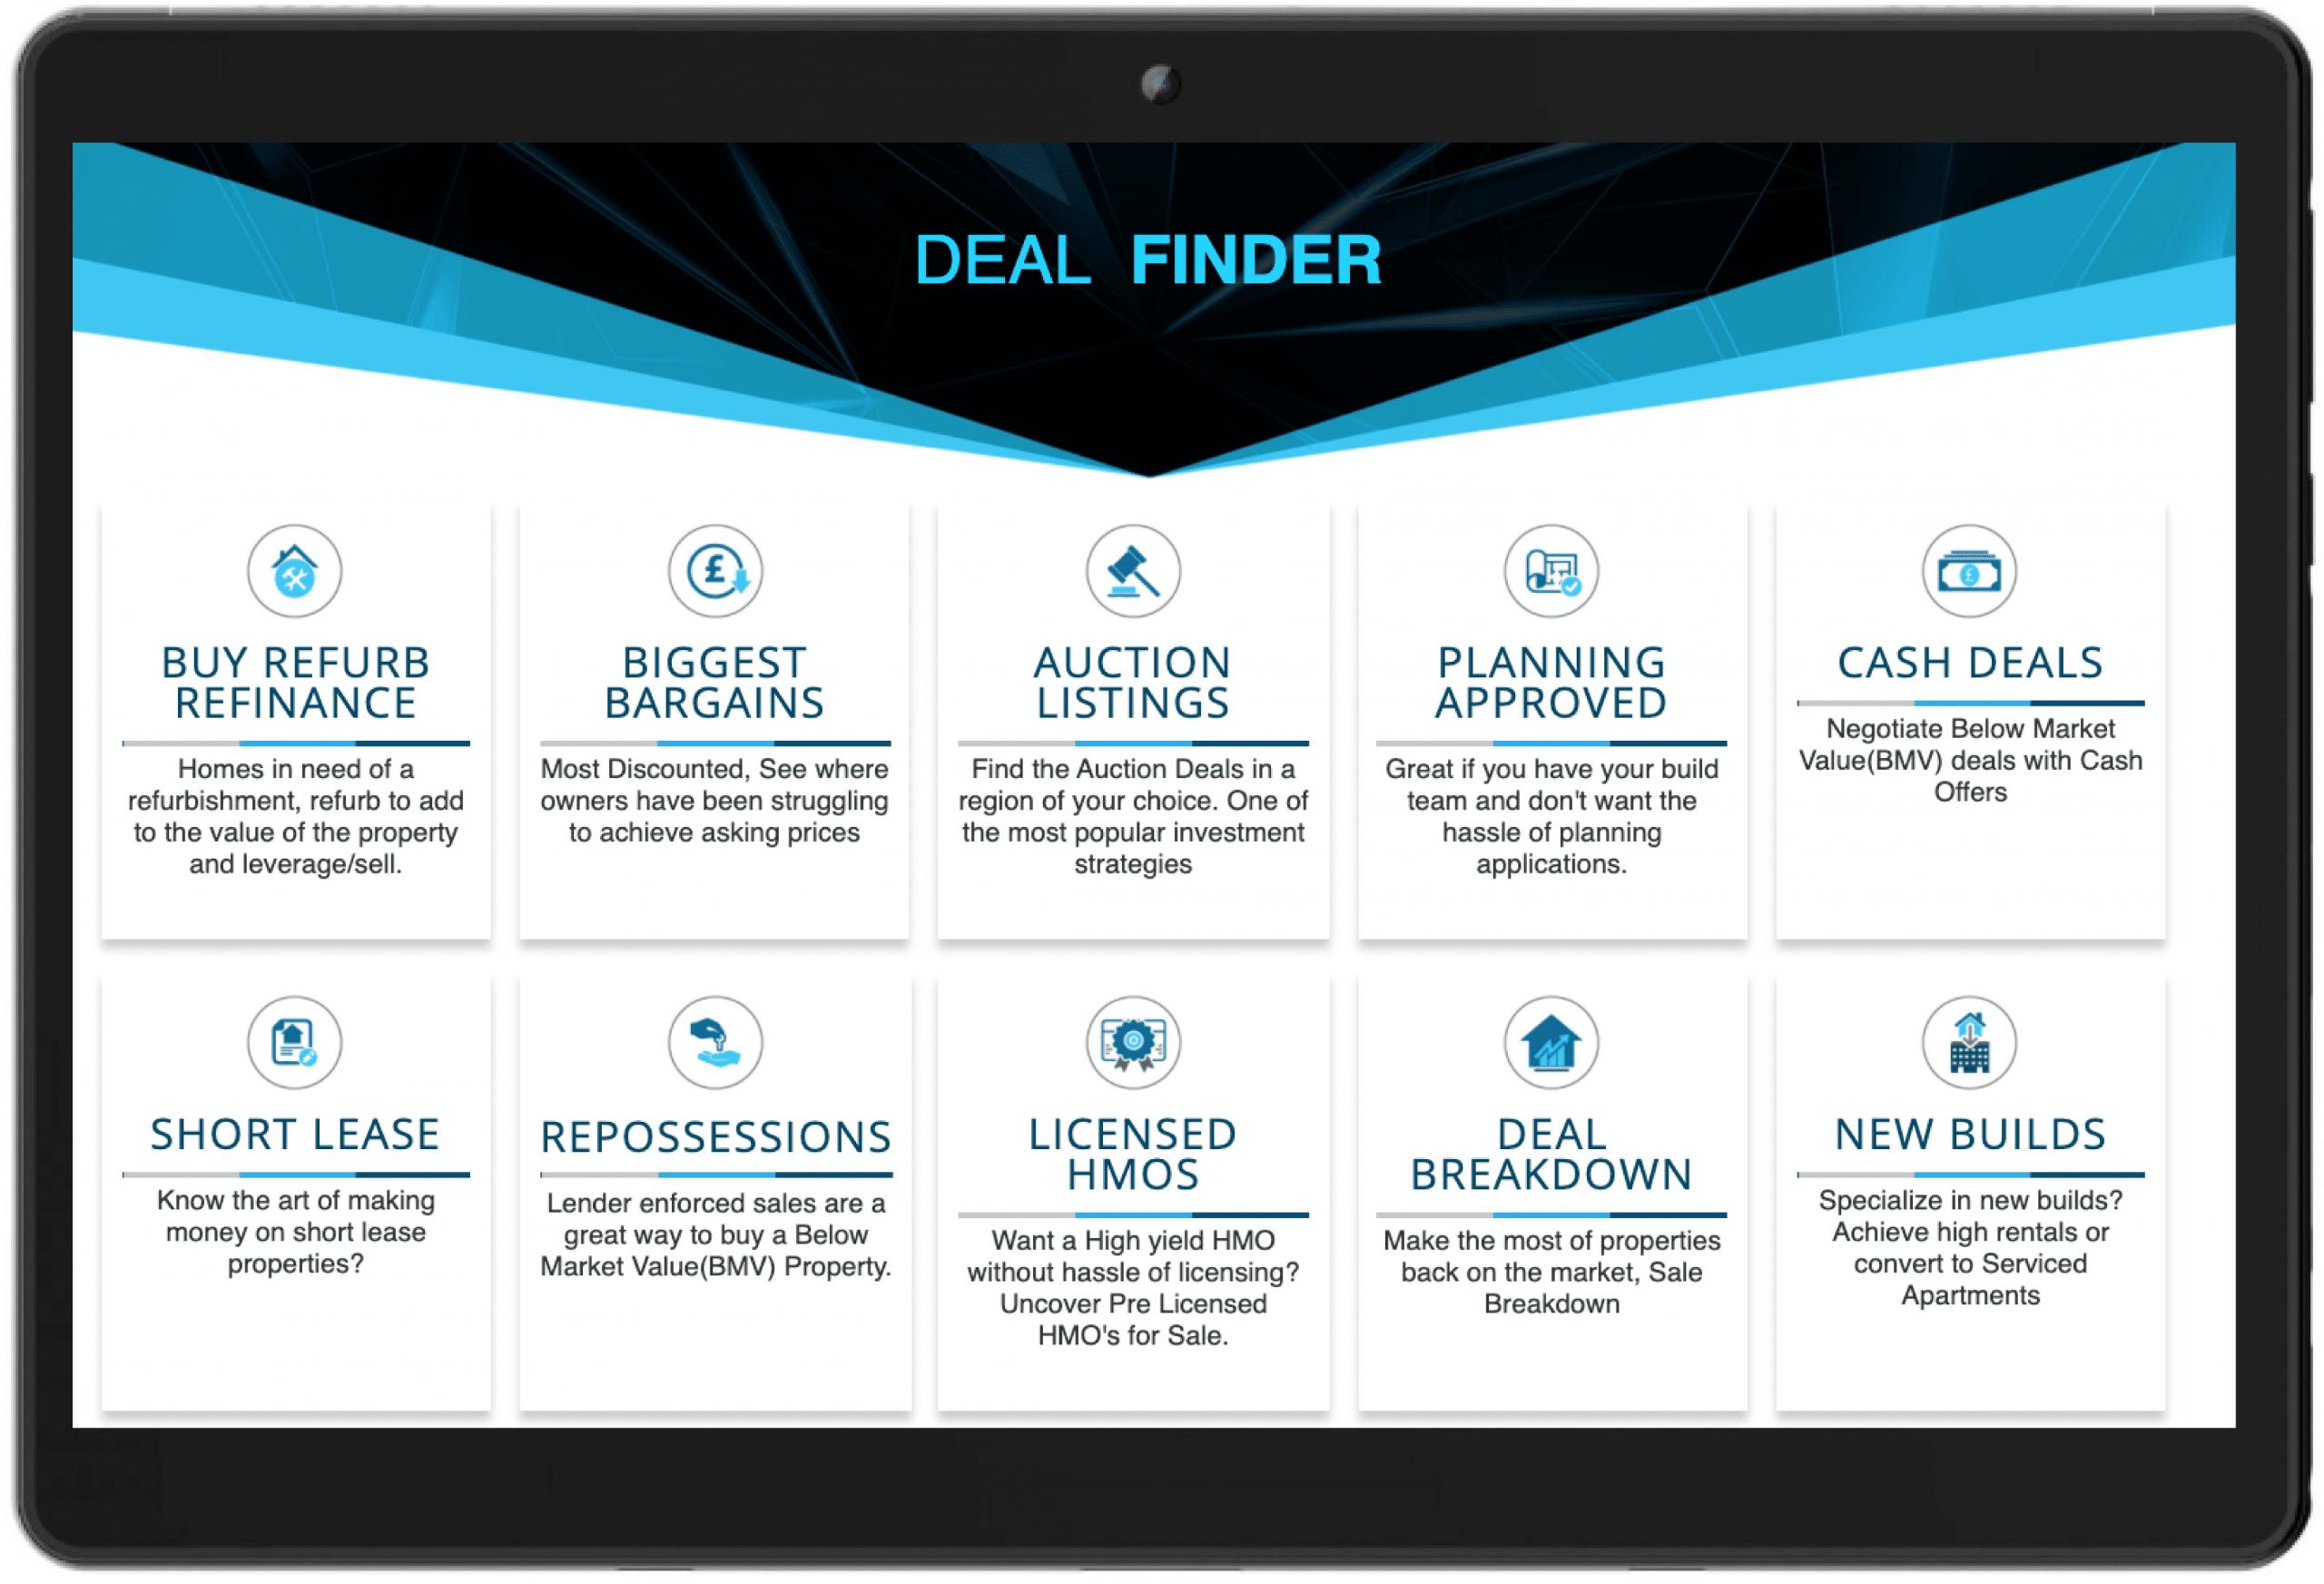 Property Deals Insight Deal Finder